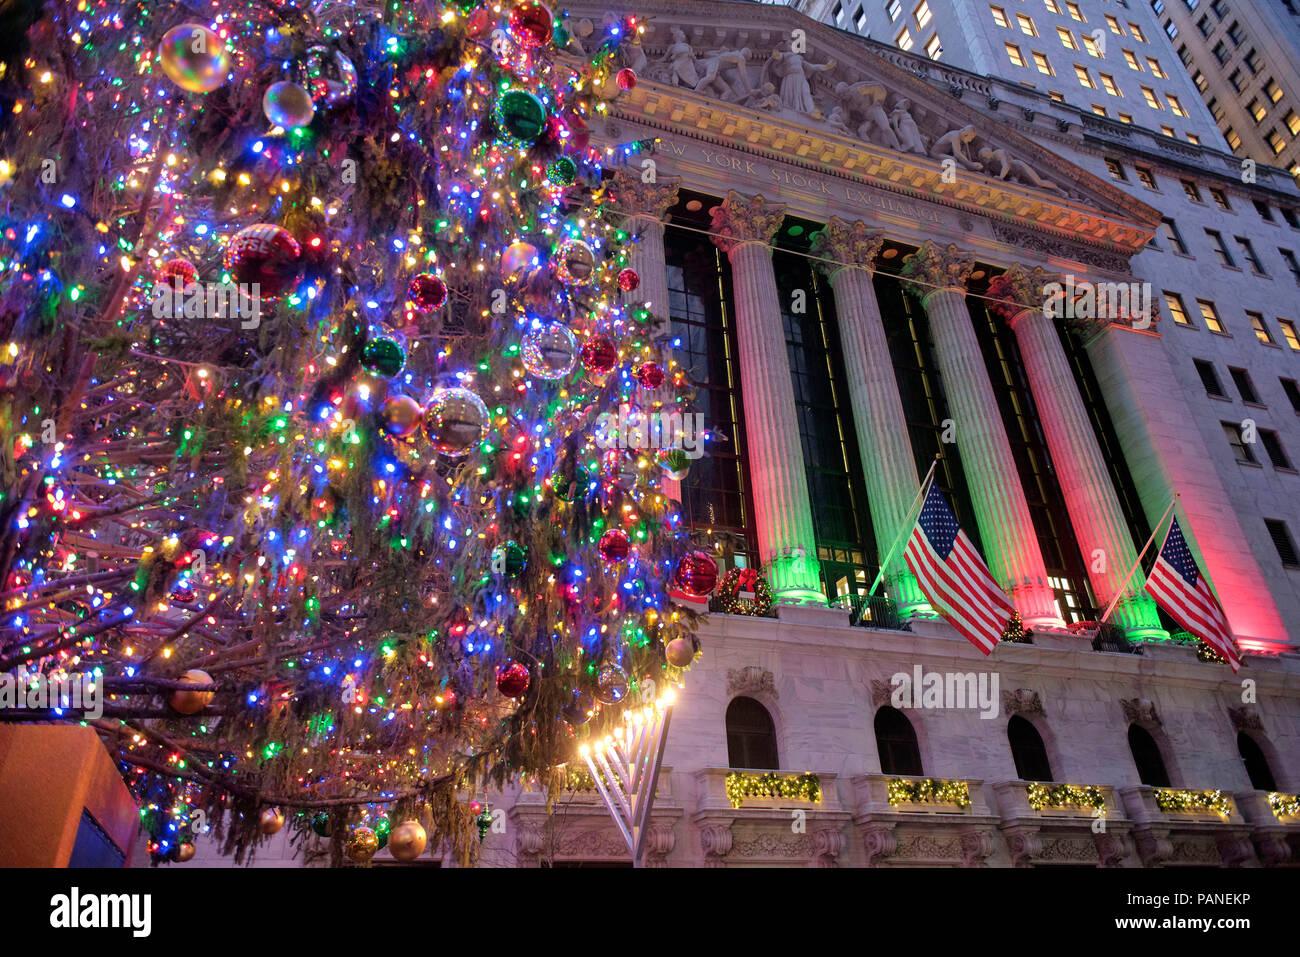 The Stock Exchange Building in Wall Street at Christmas time, Manhattan, New York City, USA, December 30, 2017    Photo © Fabio Mazzarella/Sintesi/Ala - Stock Image